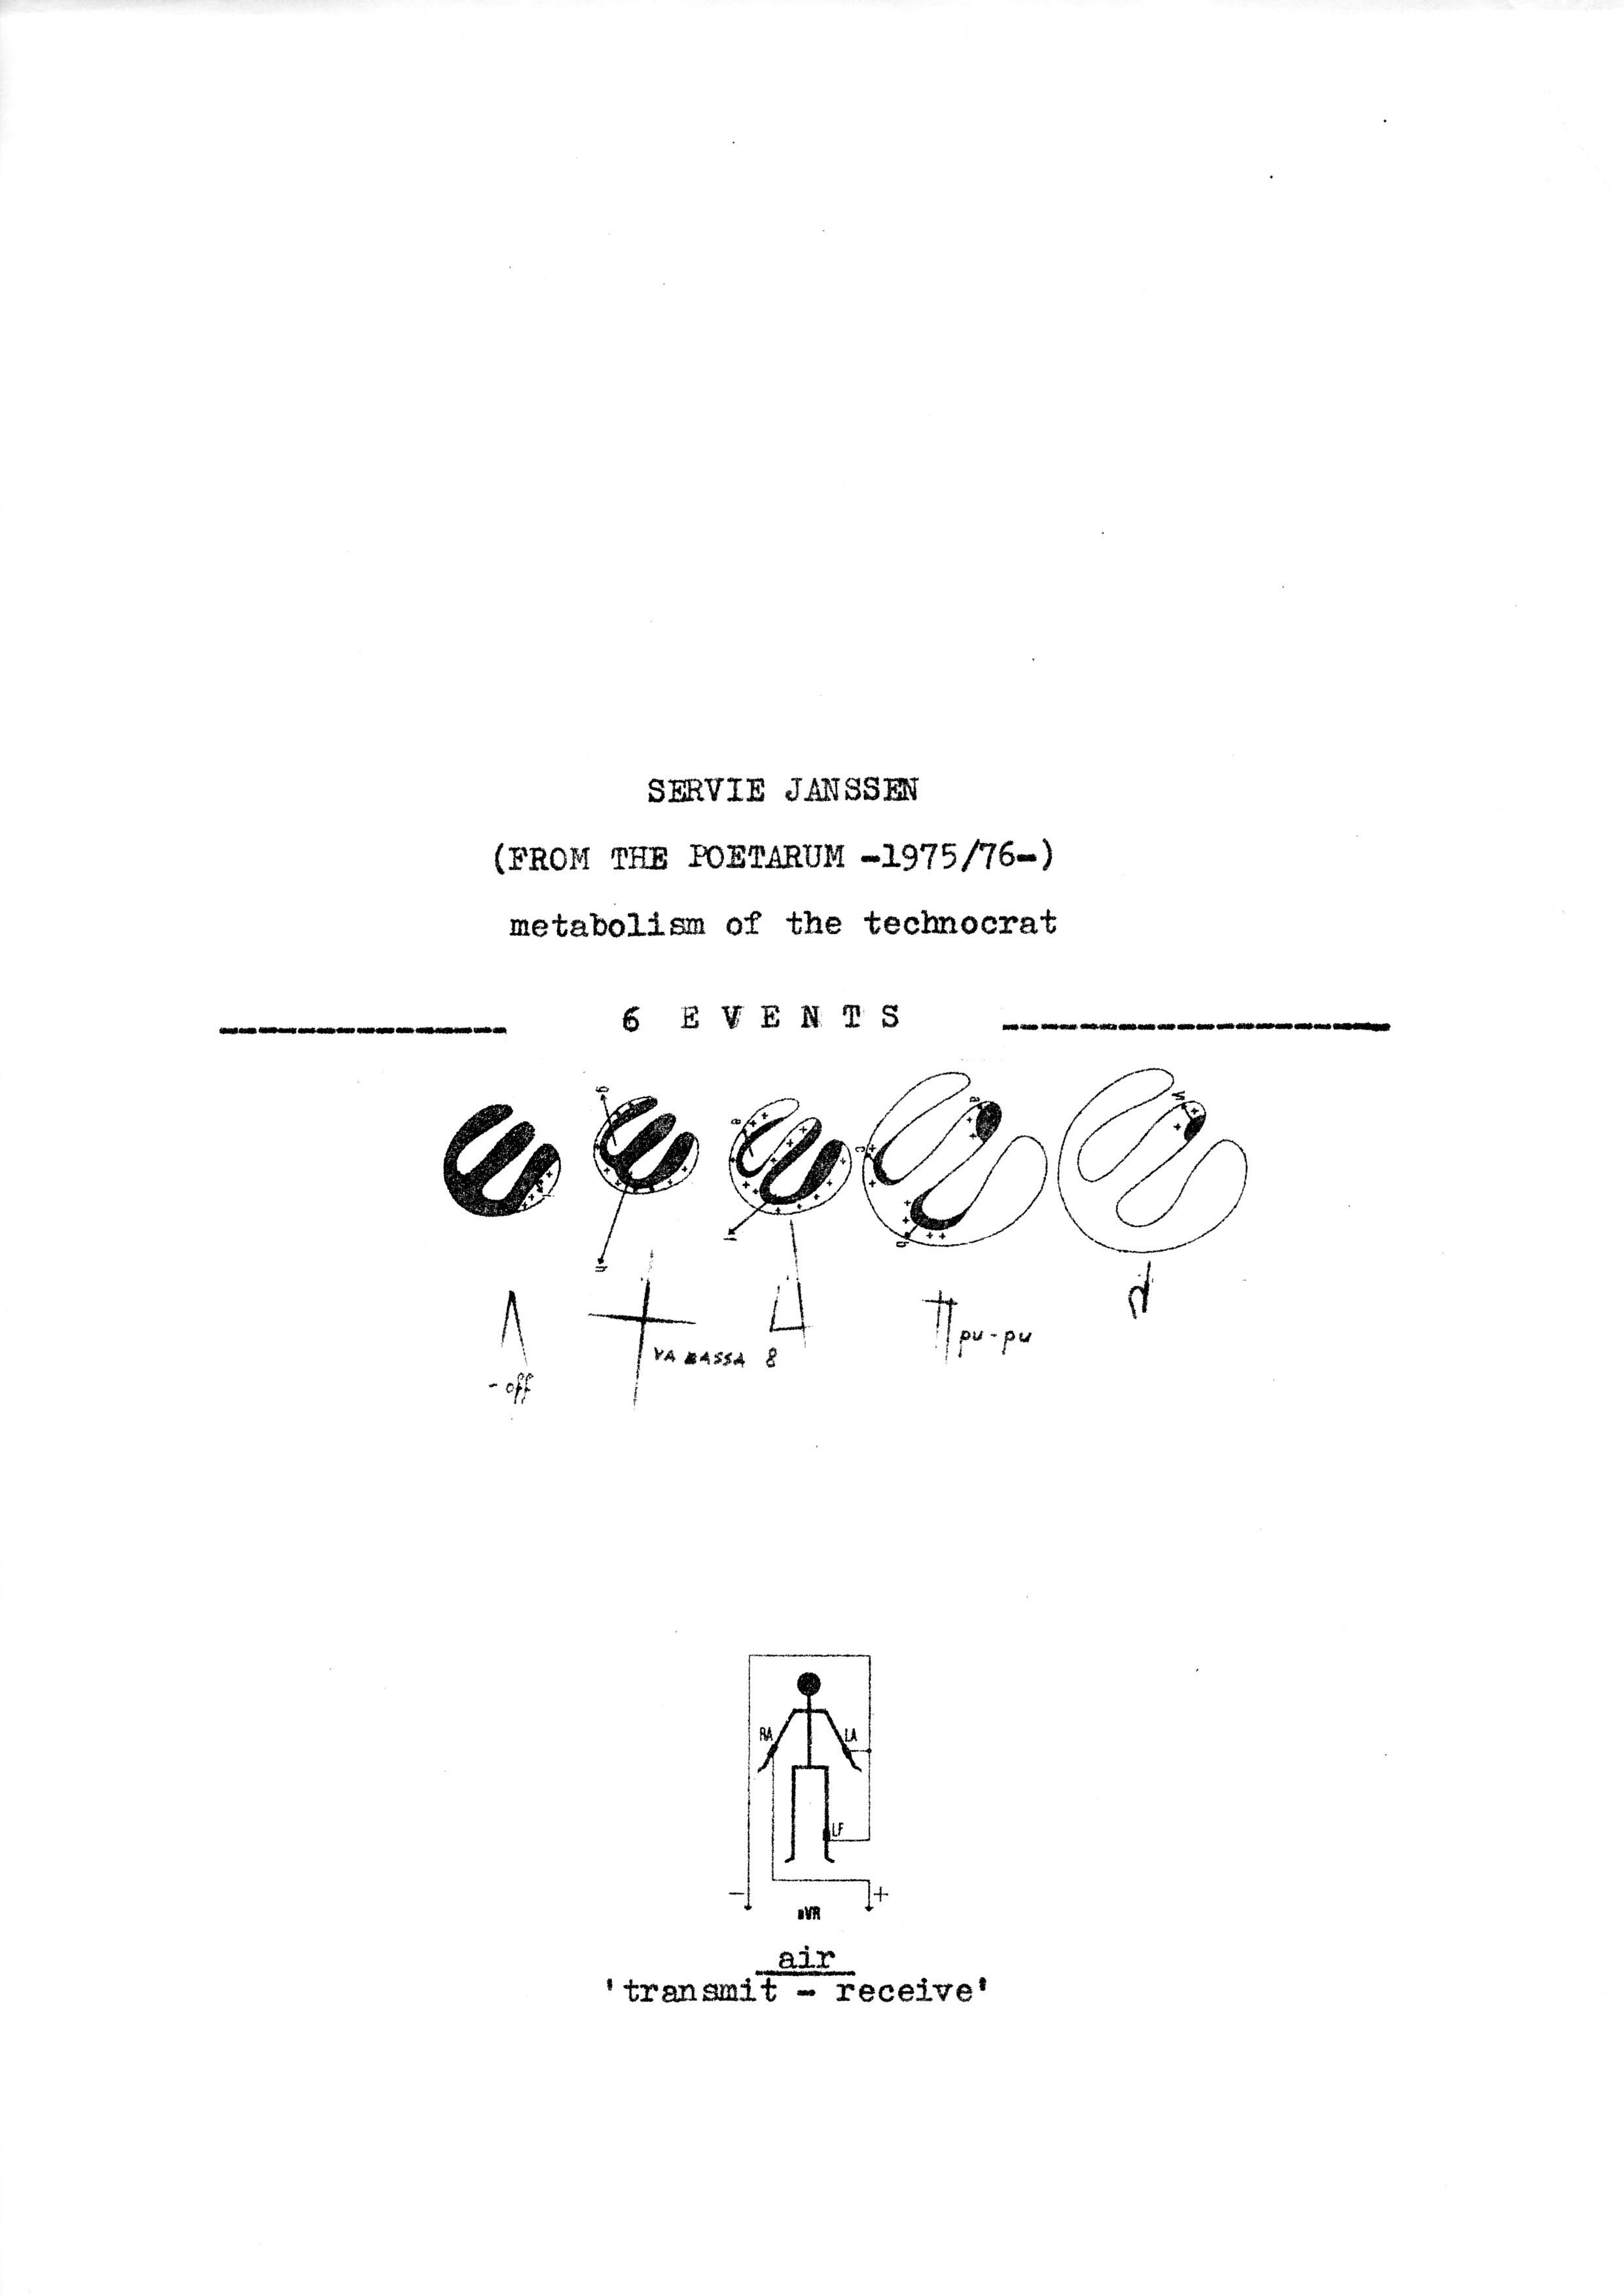 Metabolism of the technocrat,6 events,ed;100,32x23 cm., Verlag/Galerie Leaman,1976,Düsseldorf,D